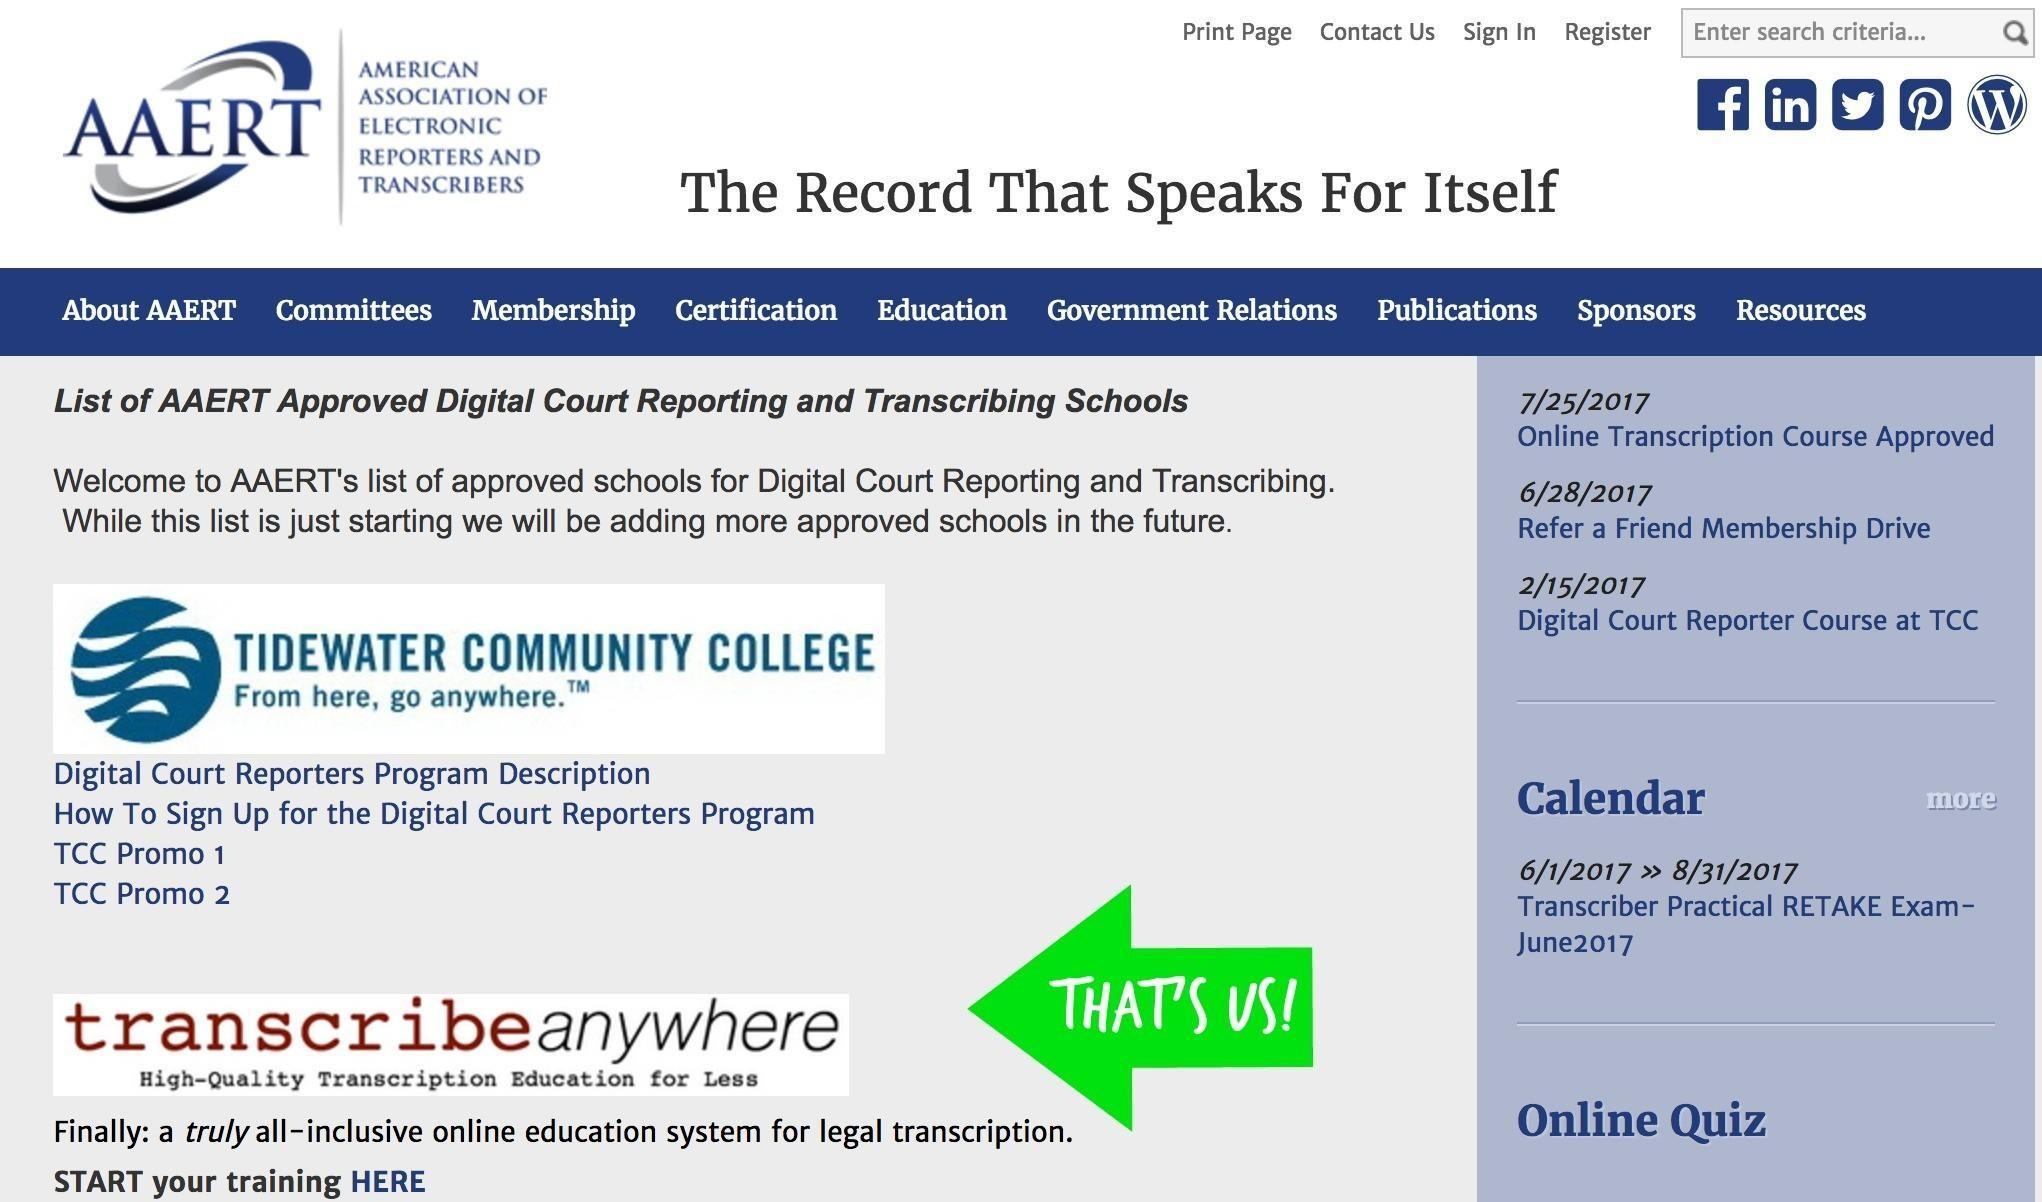 All-Inclusive Online Course in General Transcription